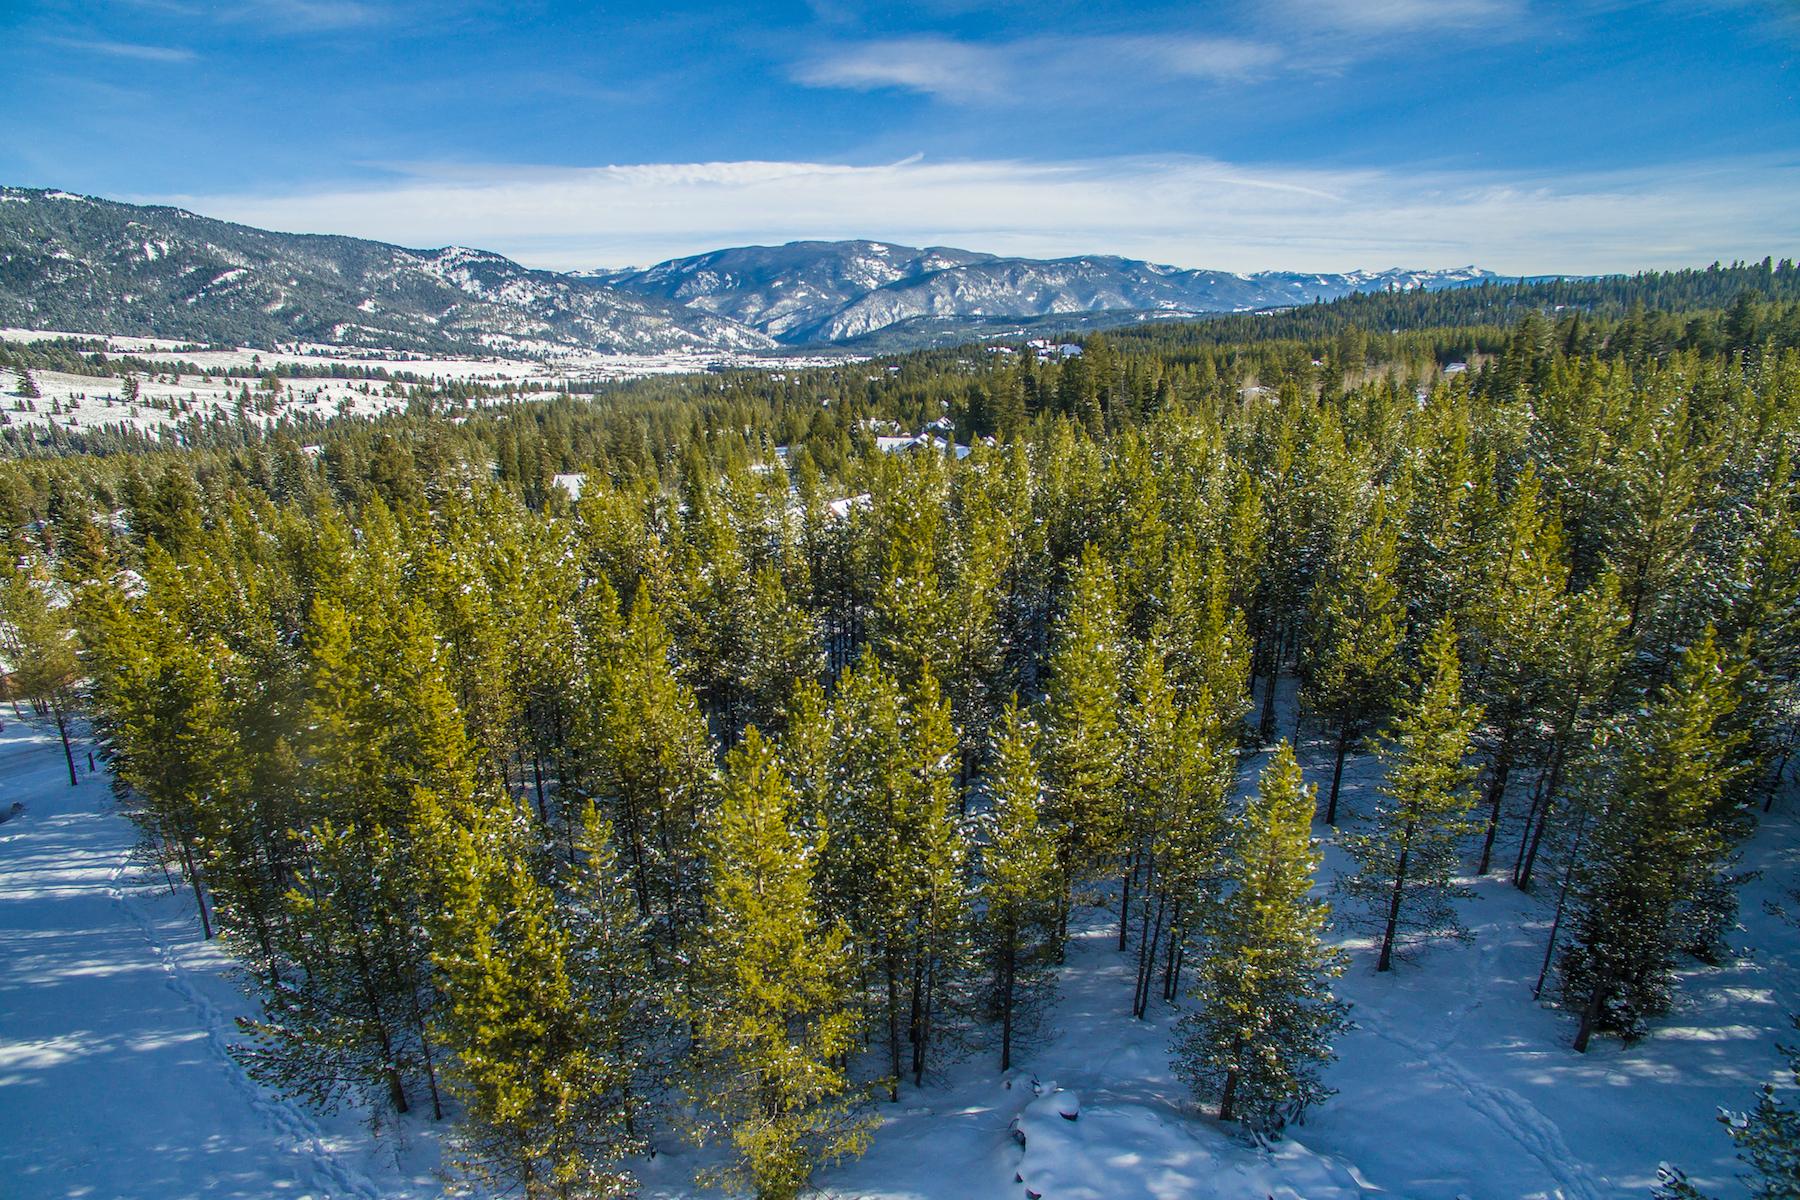 Terreno por un Venta en Aspen Groves Homesite West Pine Cone Terrace, Lot 25 Big Sky, Montana, 59716 Estados Unidos